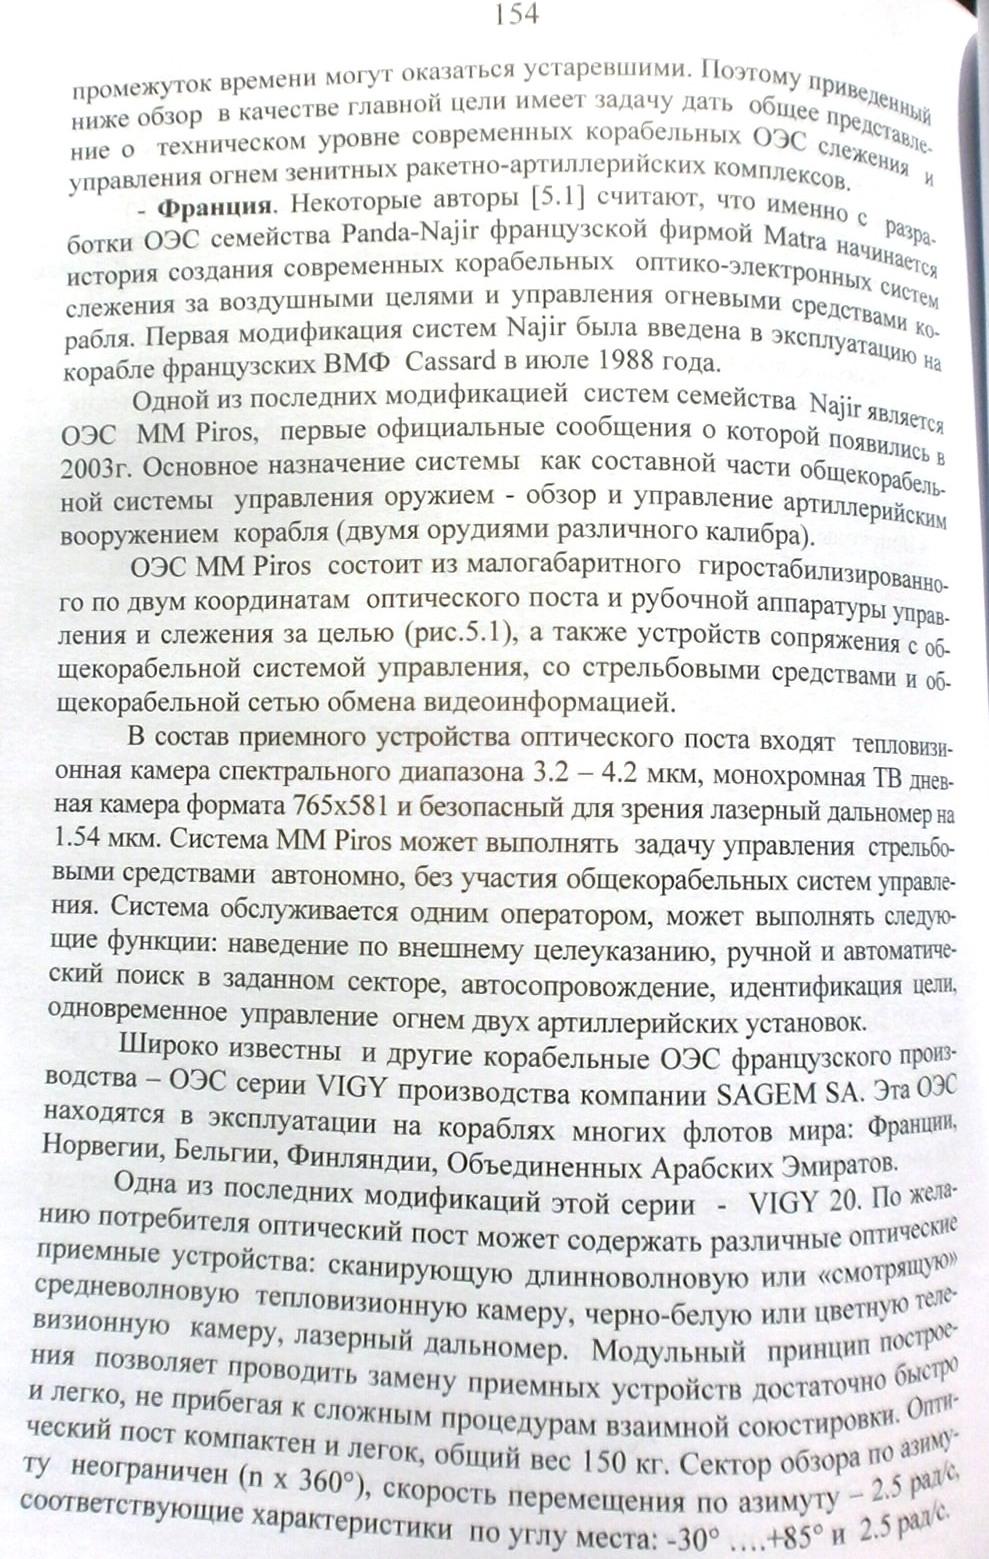 http://s5.uploads.ru/DPLxi.jpg